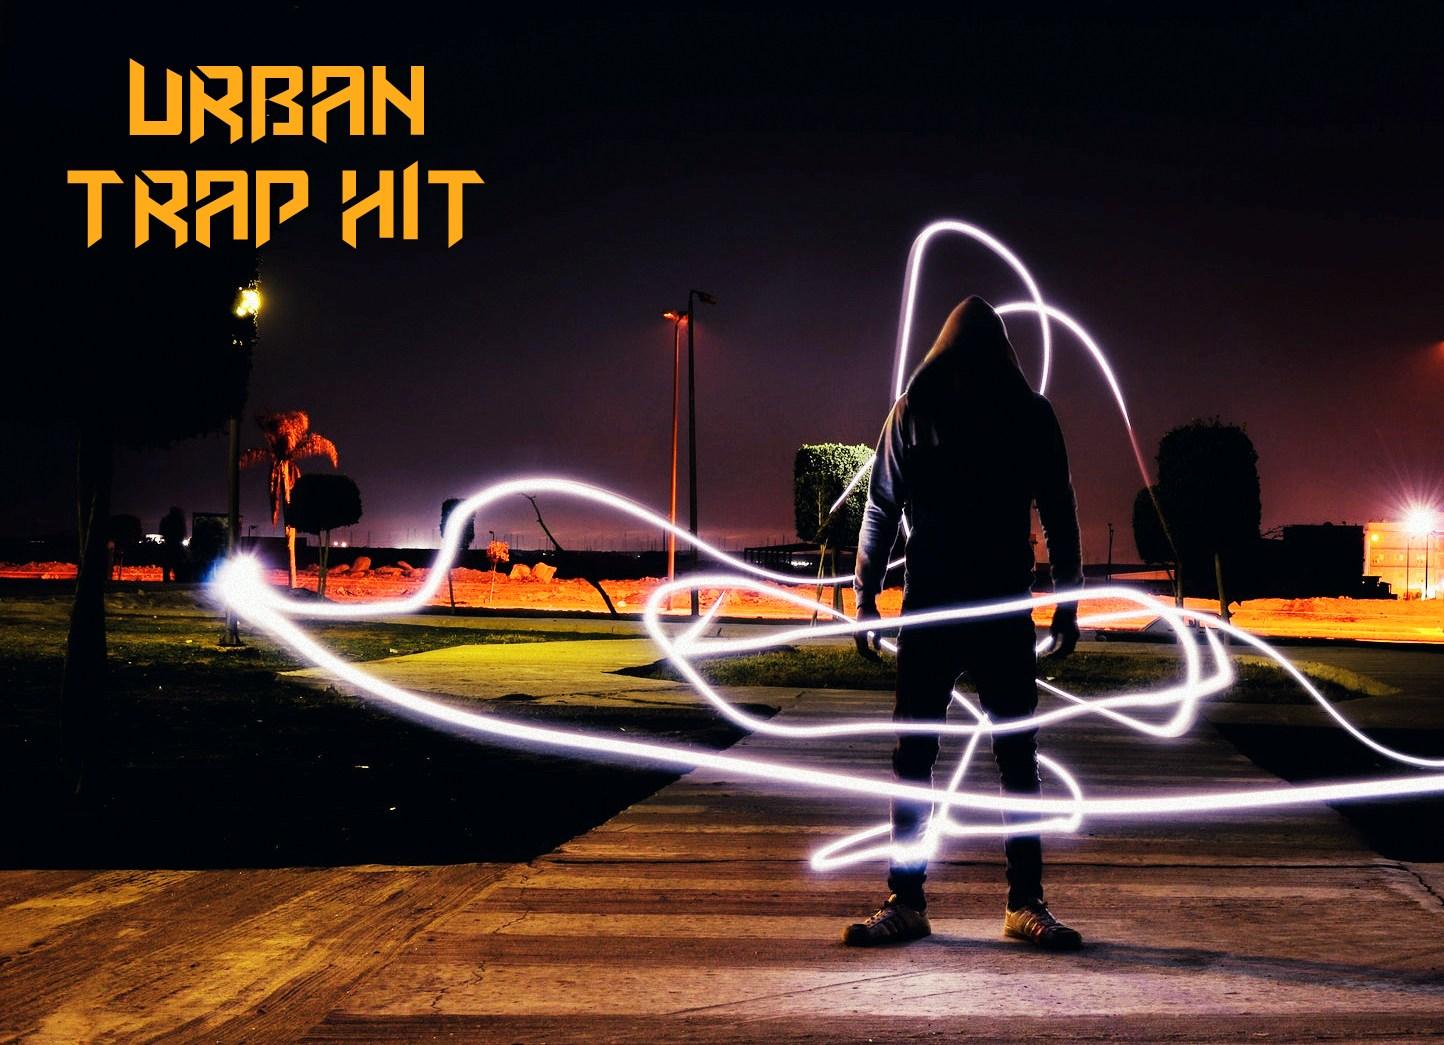 Trap Club Hit - 1